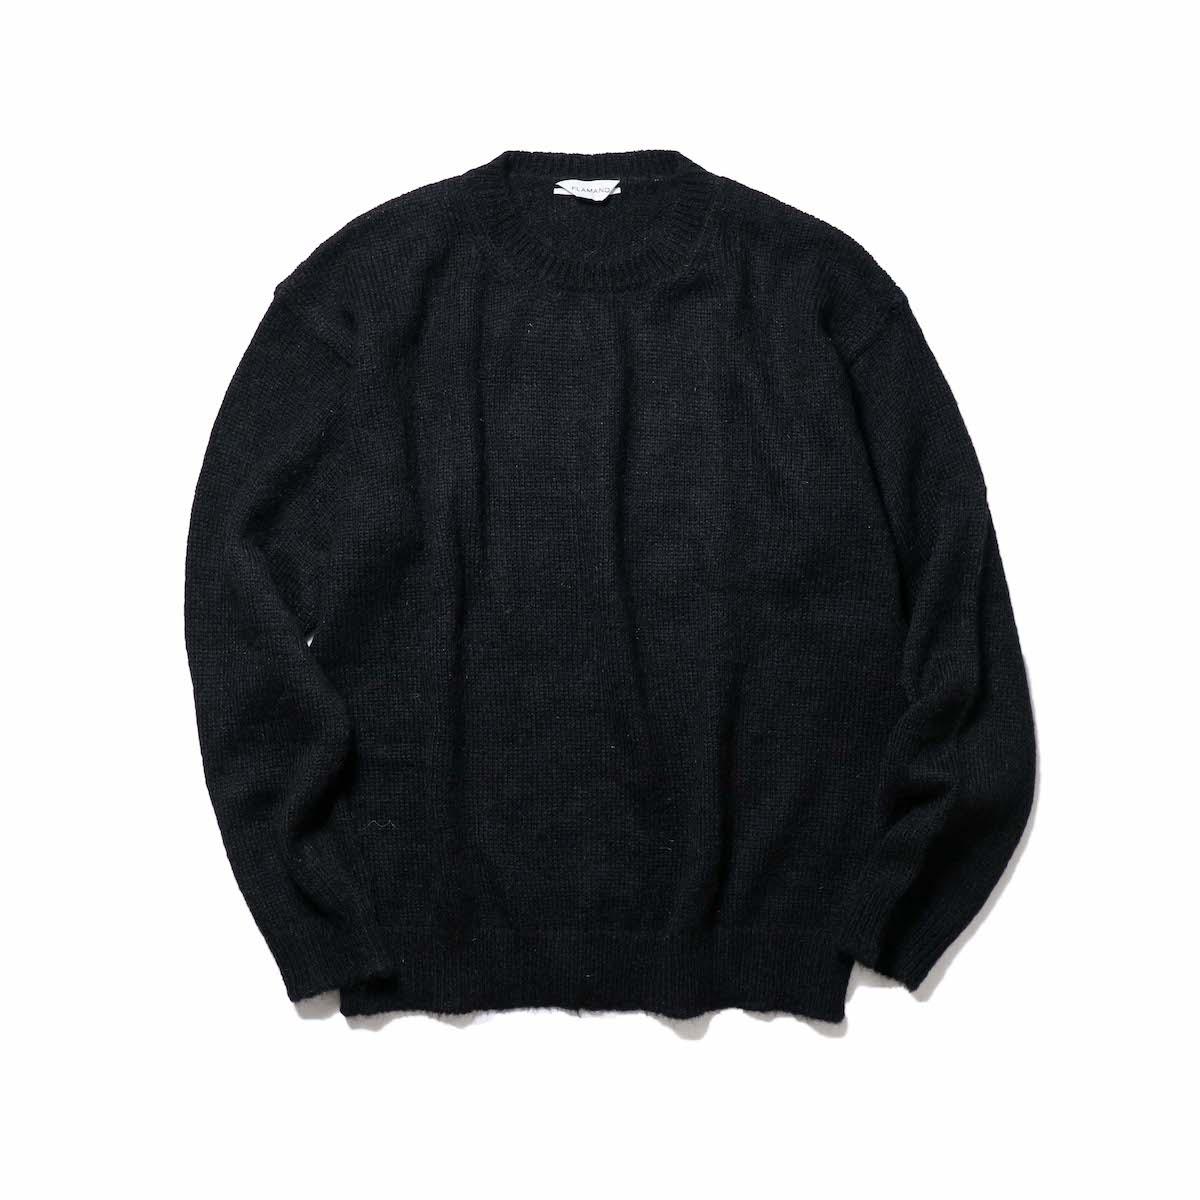 FLAMAND / Mohair Basic (Black)